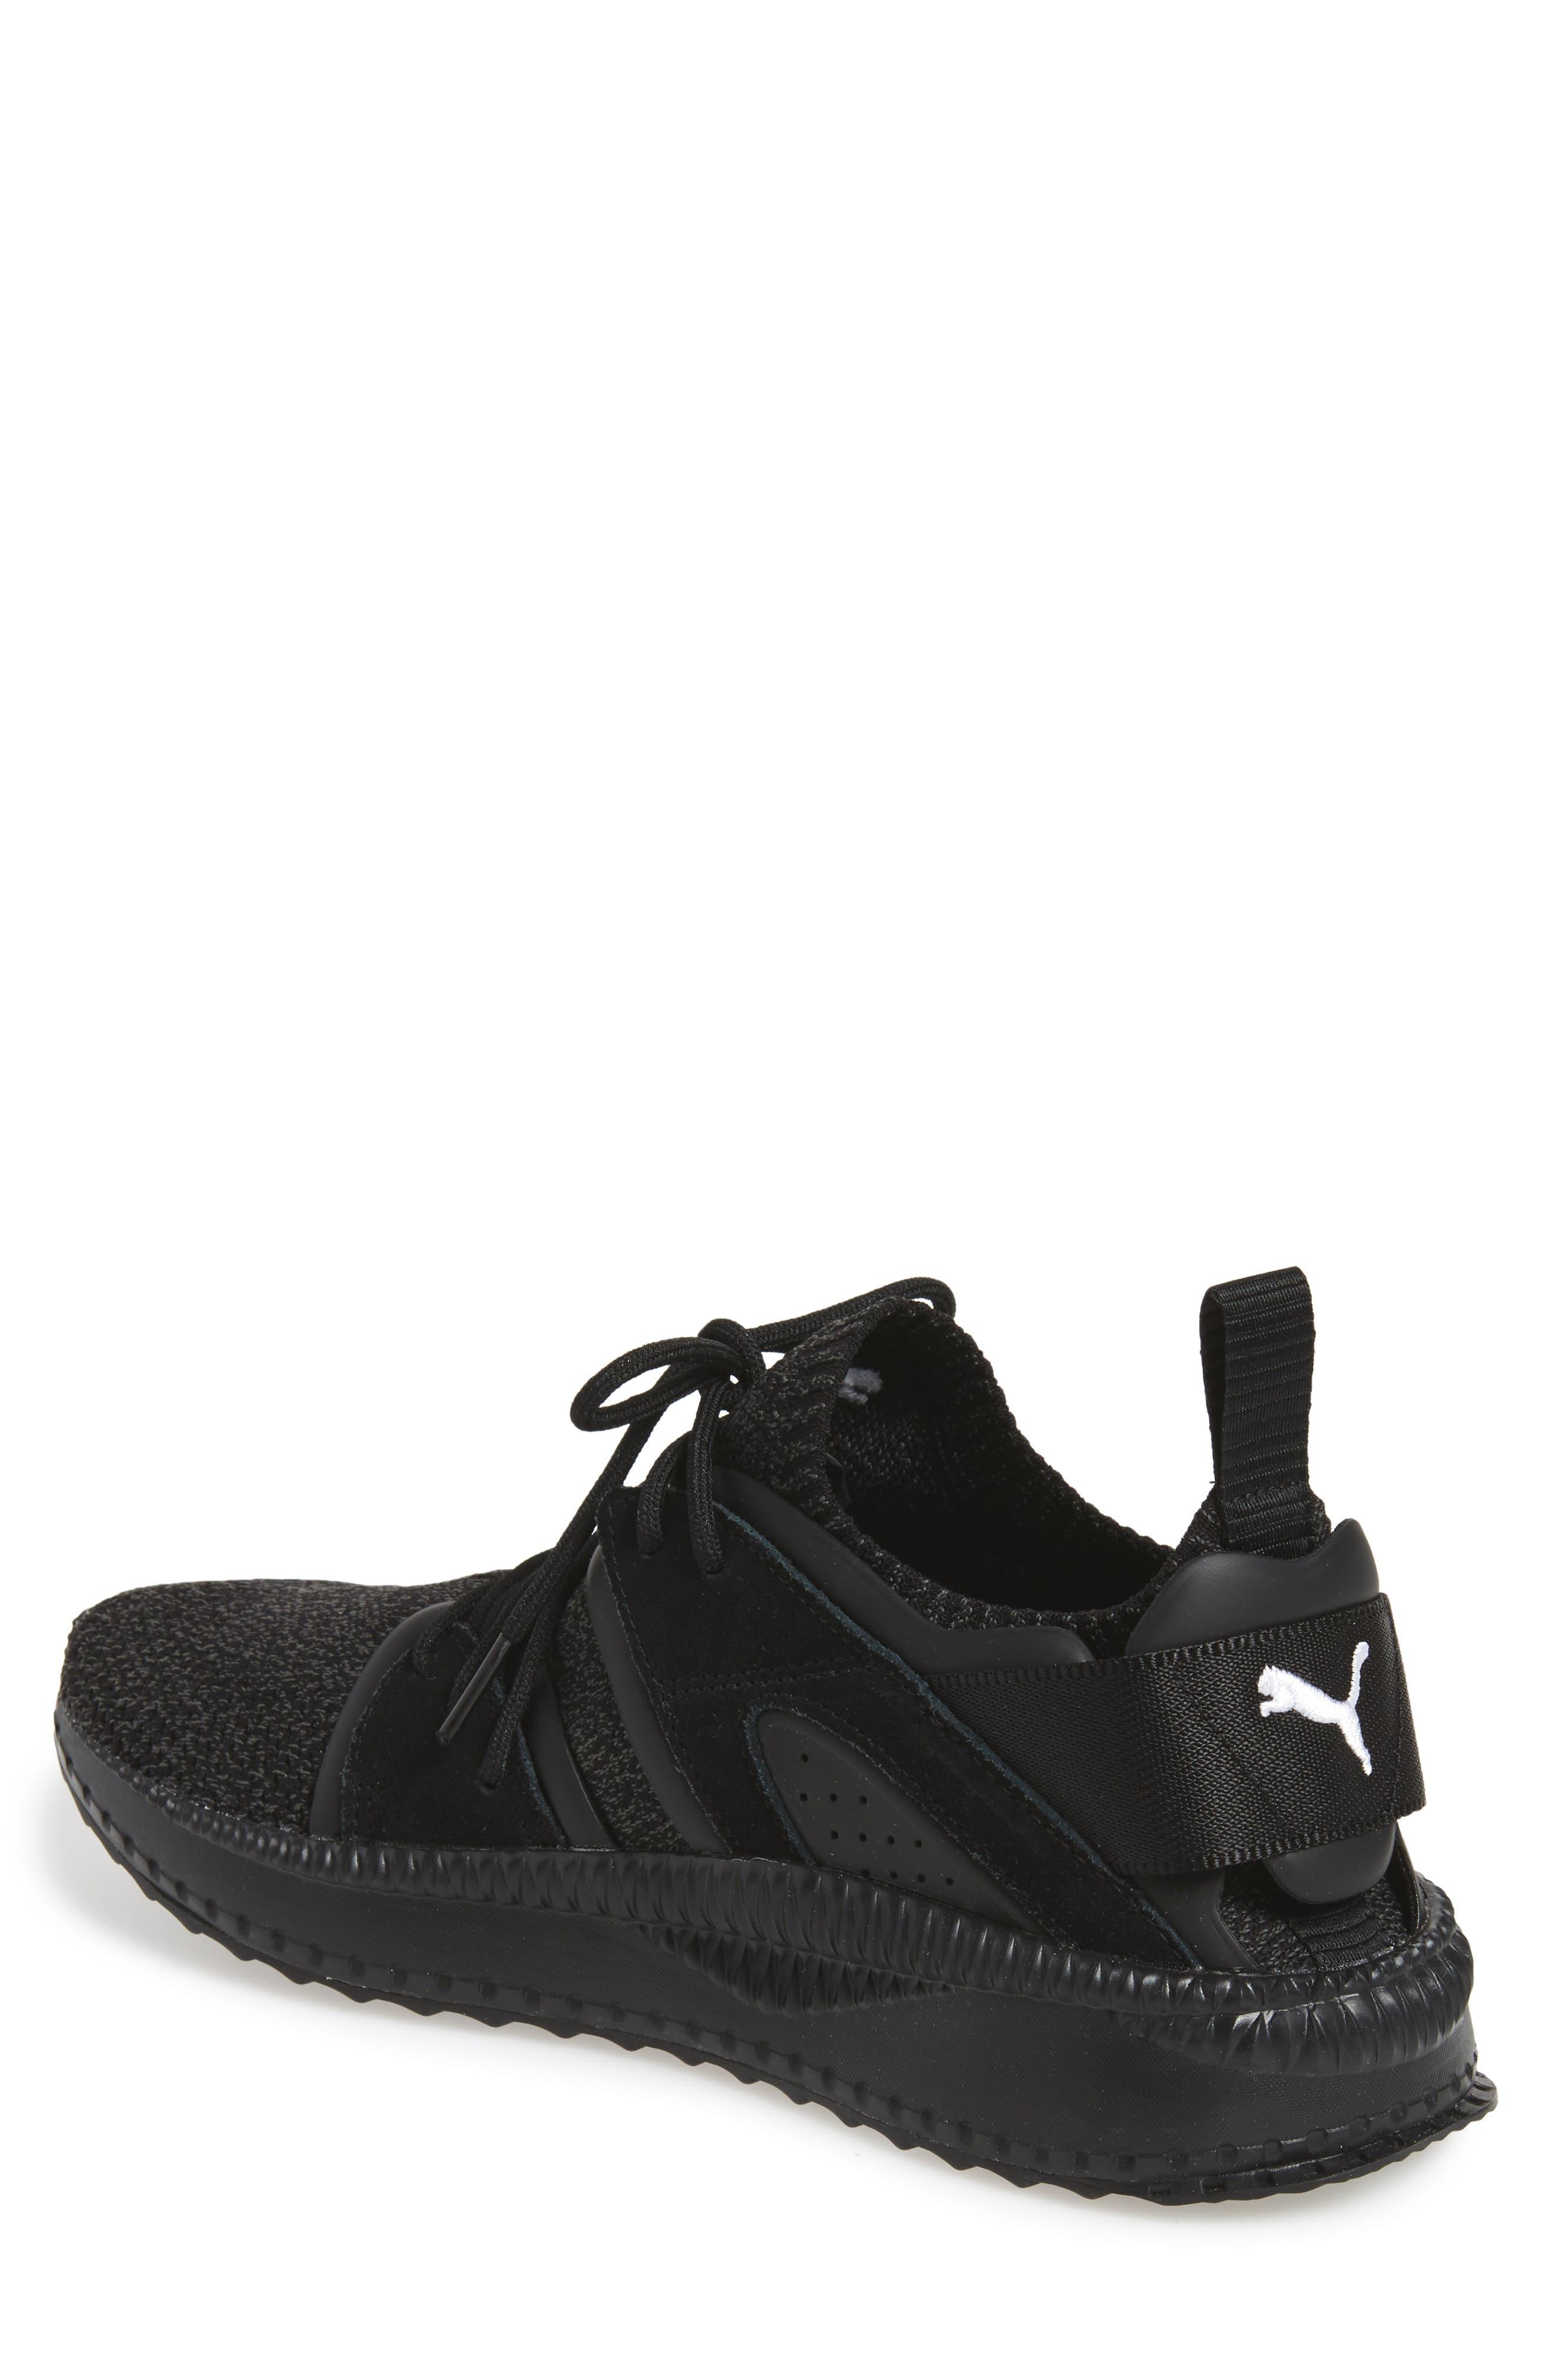 Tsugi Blaze EvoKnit Sneaker,                             Alternate thumbnail 2, color,